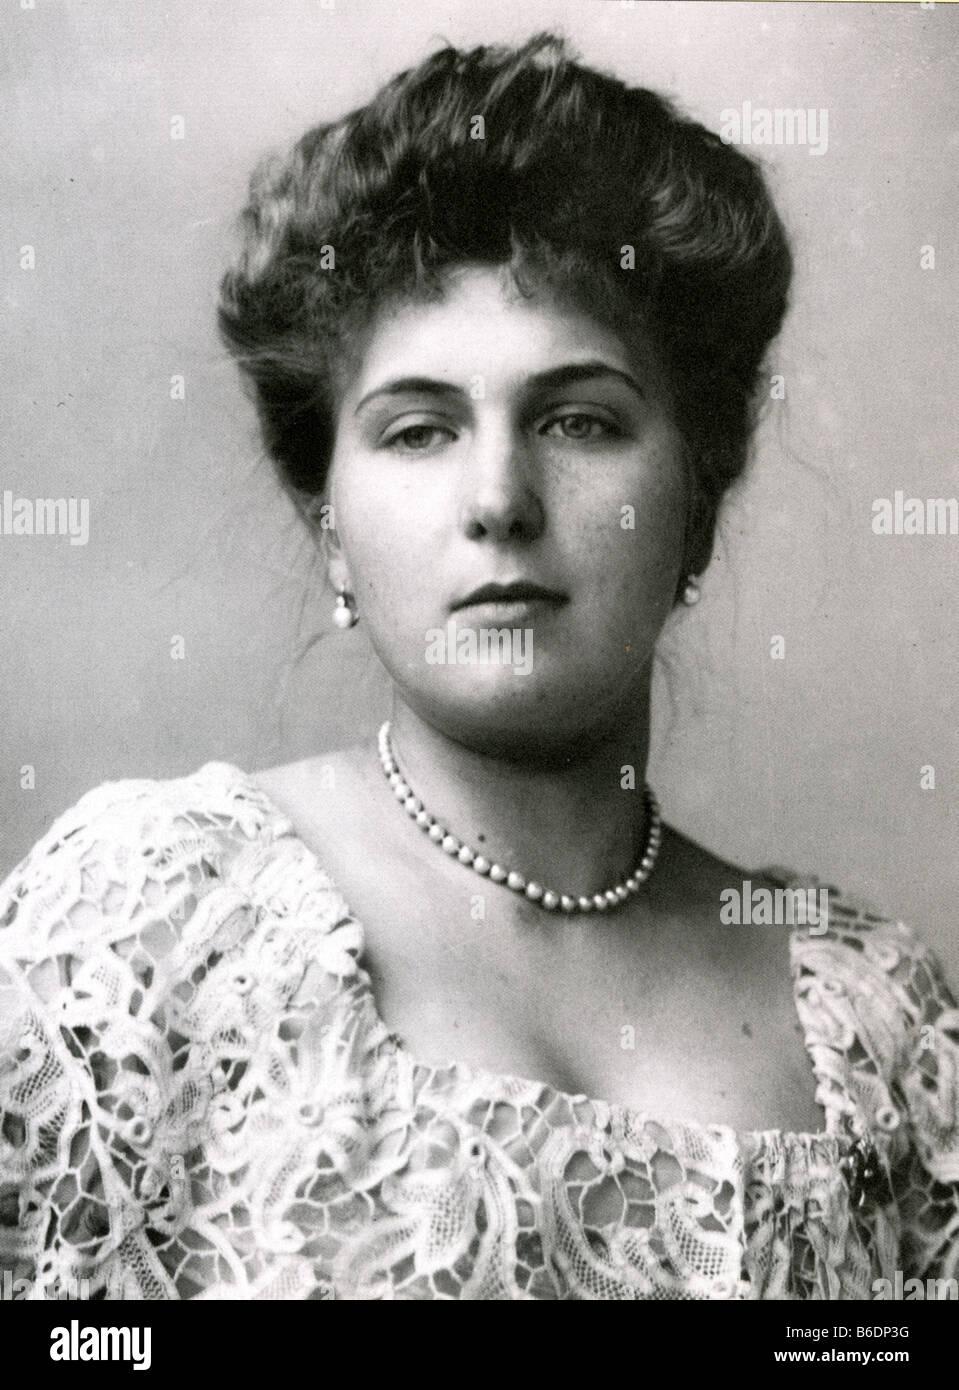 VICTORIA Eugenia de Battenberg 1887 - 1969. Reina consorte del Rey Alfonso XIII de España y nieta de la Reina Imagen De Stock